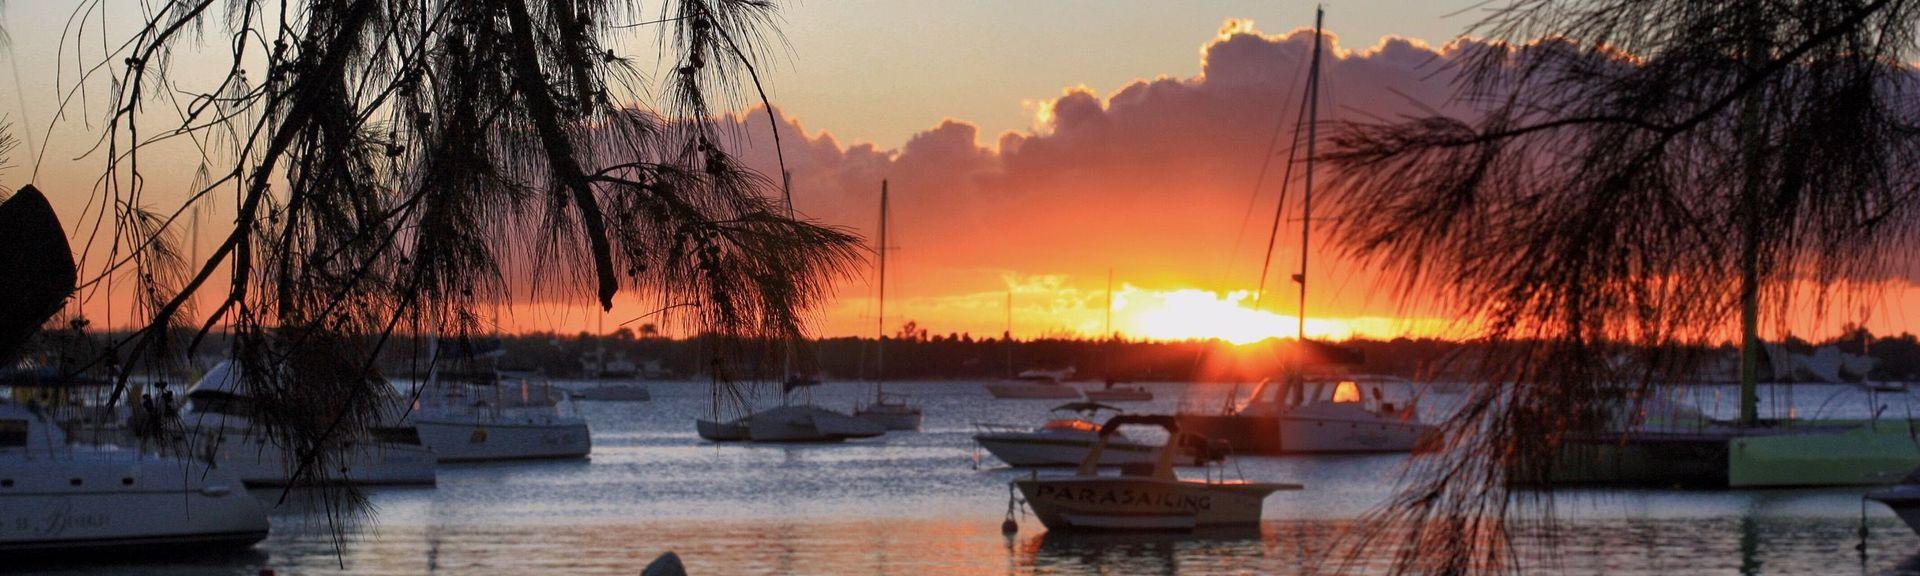 Grand Baie, Mauritius